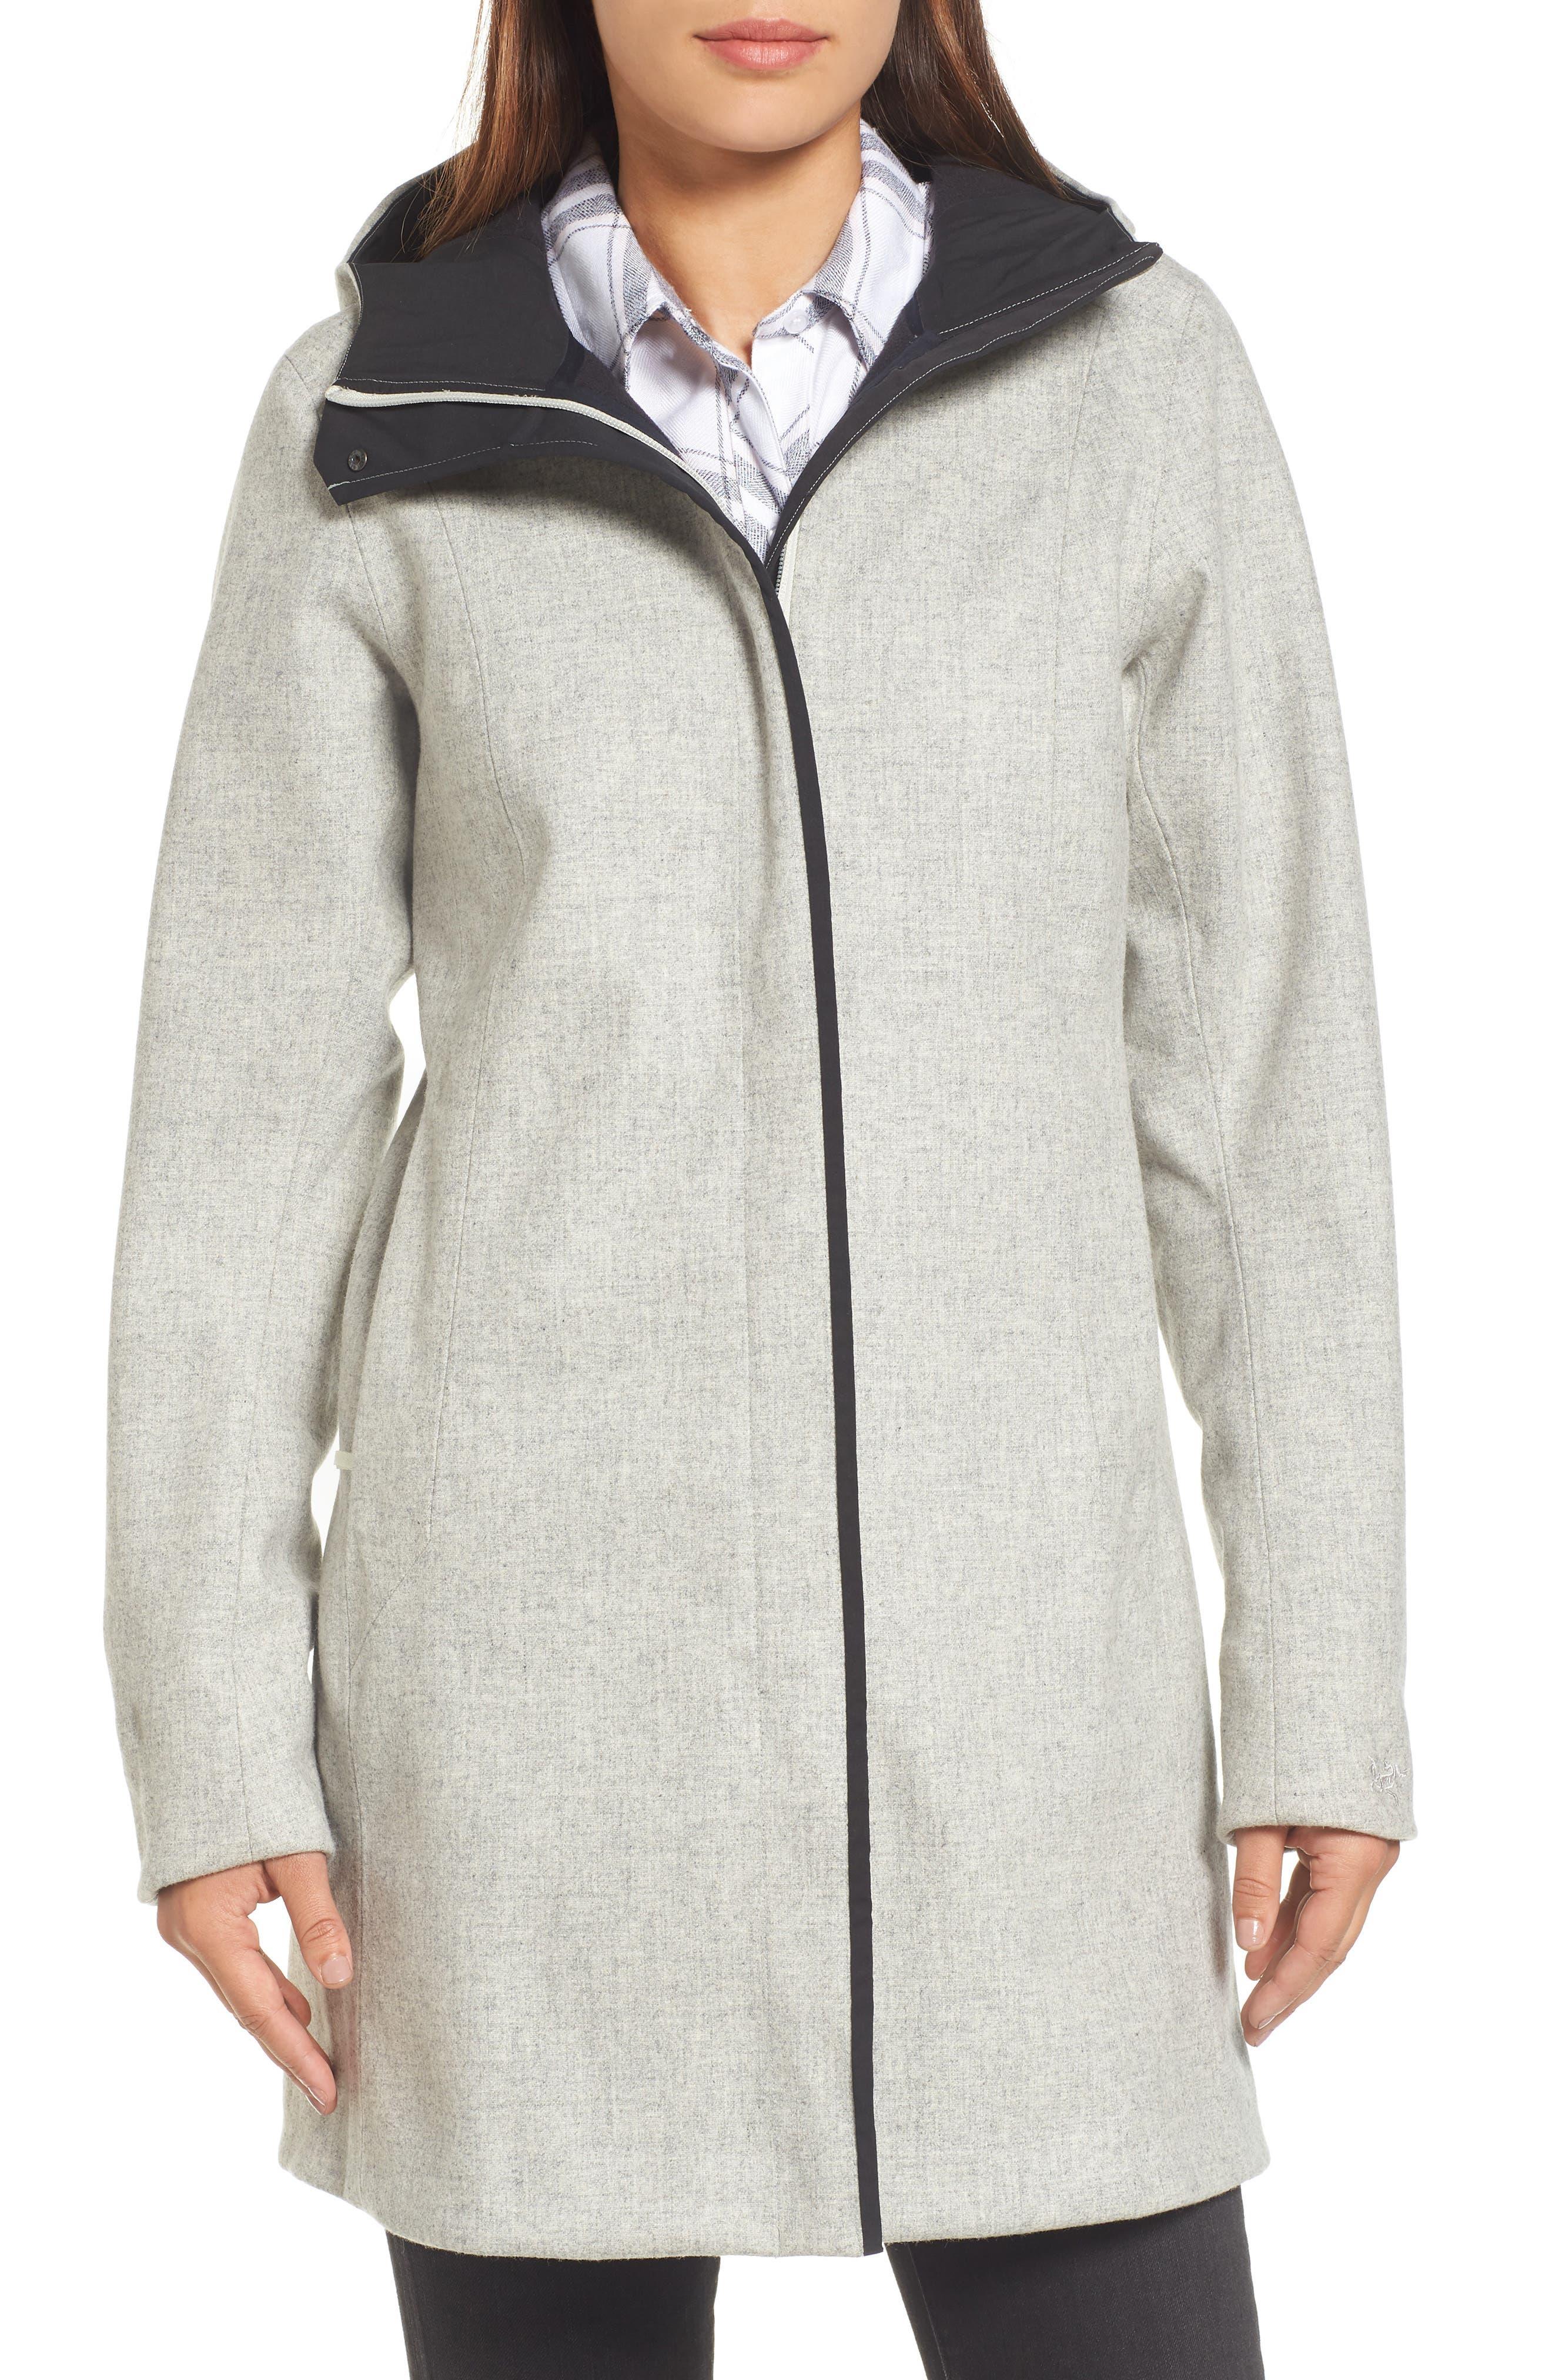 Main Image - Arc'teryx Embra Hooded Walking Coat